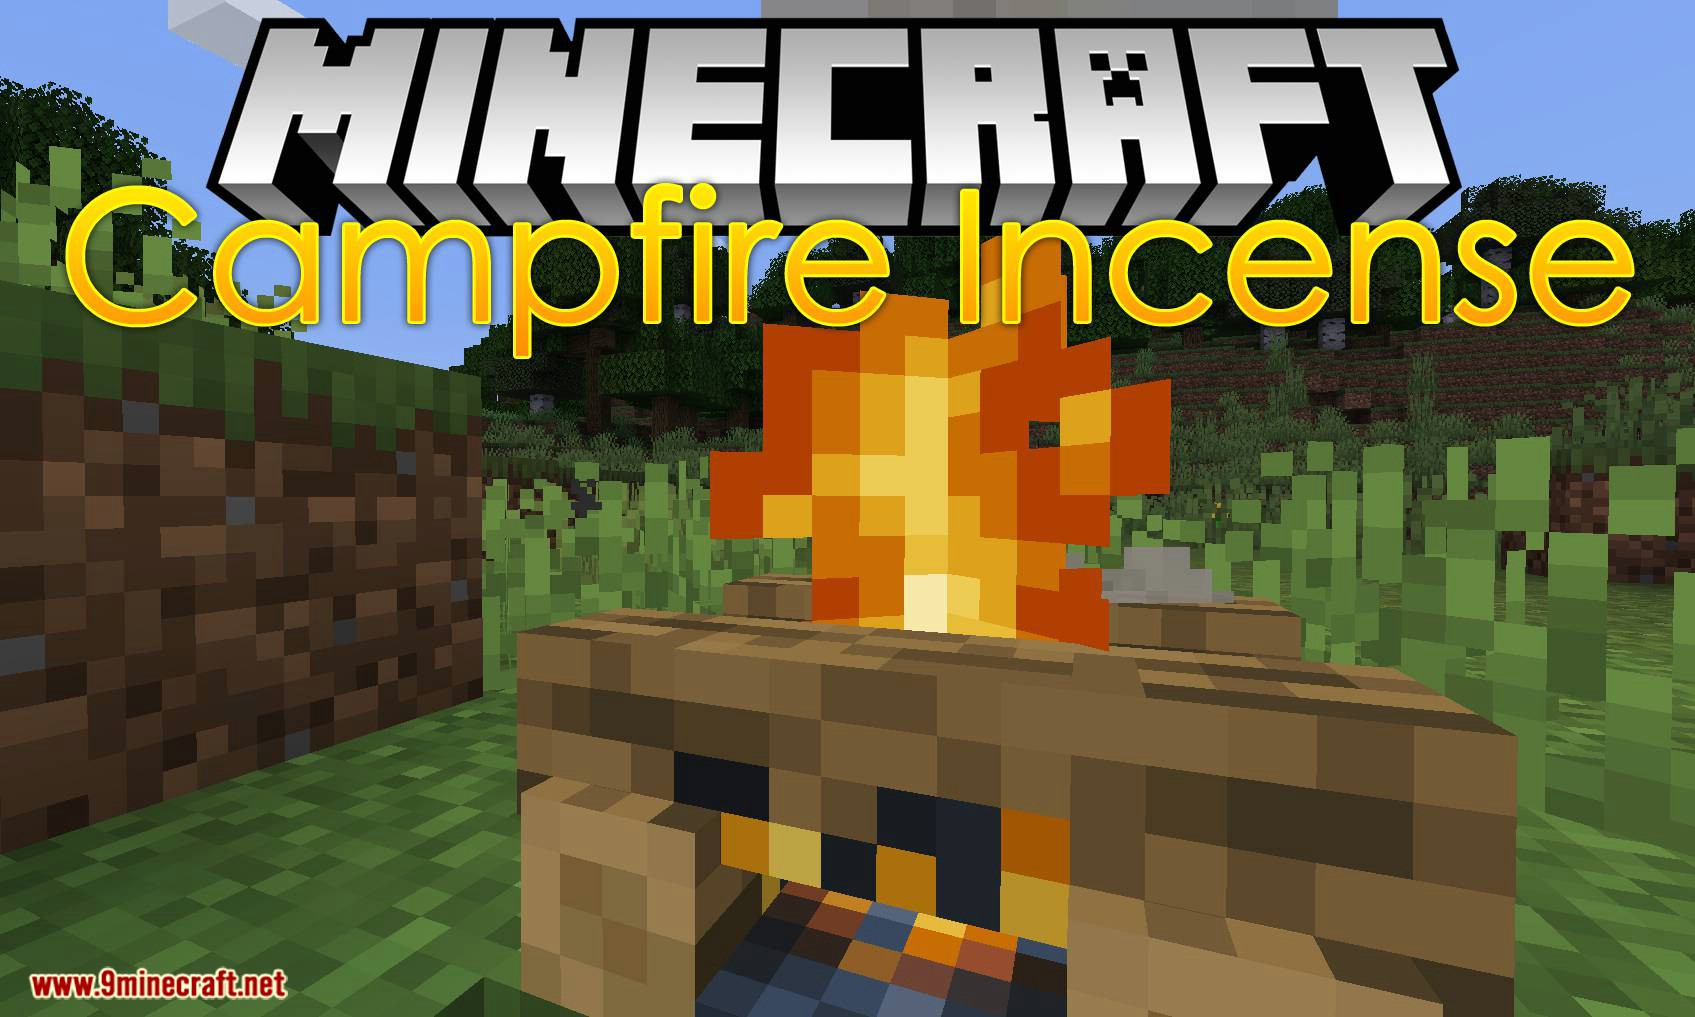 Campfire Incense mod for minecraft logo